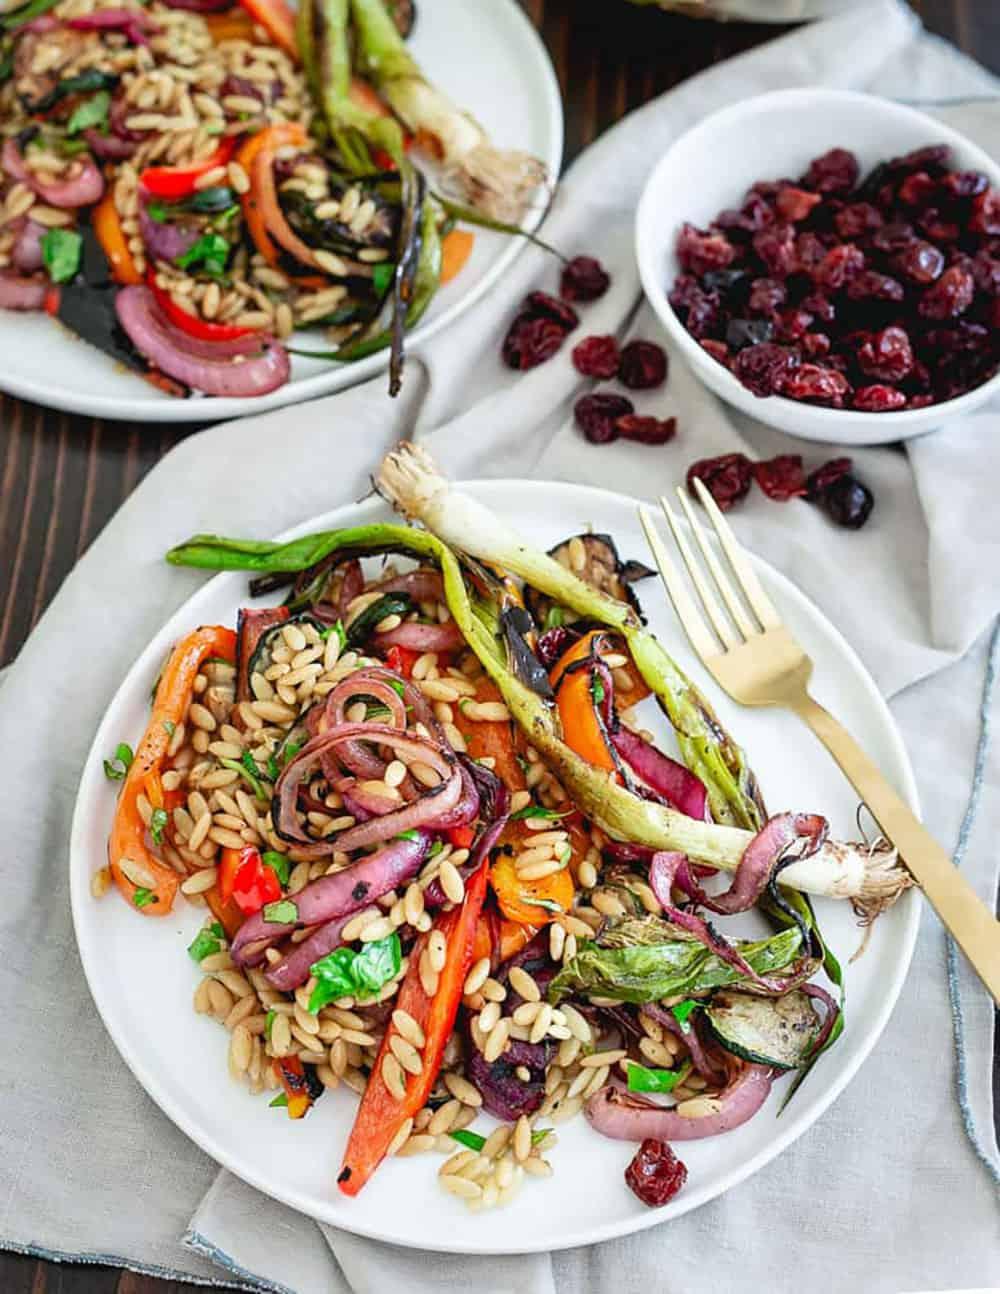 Tart Cherries Balsamic Grilled Summer Vegetable Pasta Salad